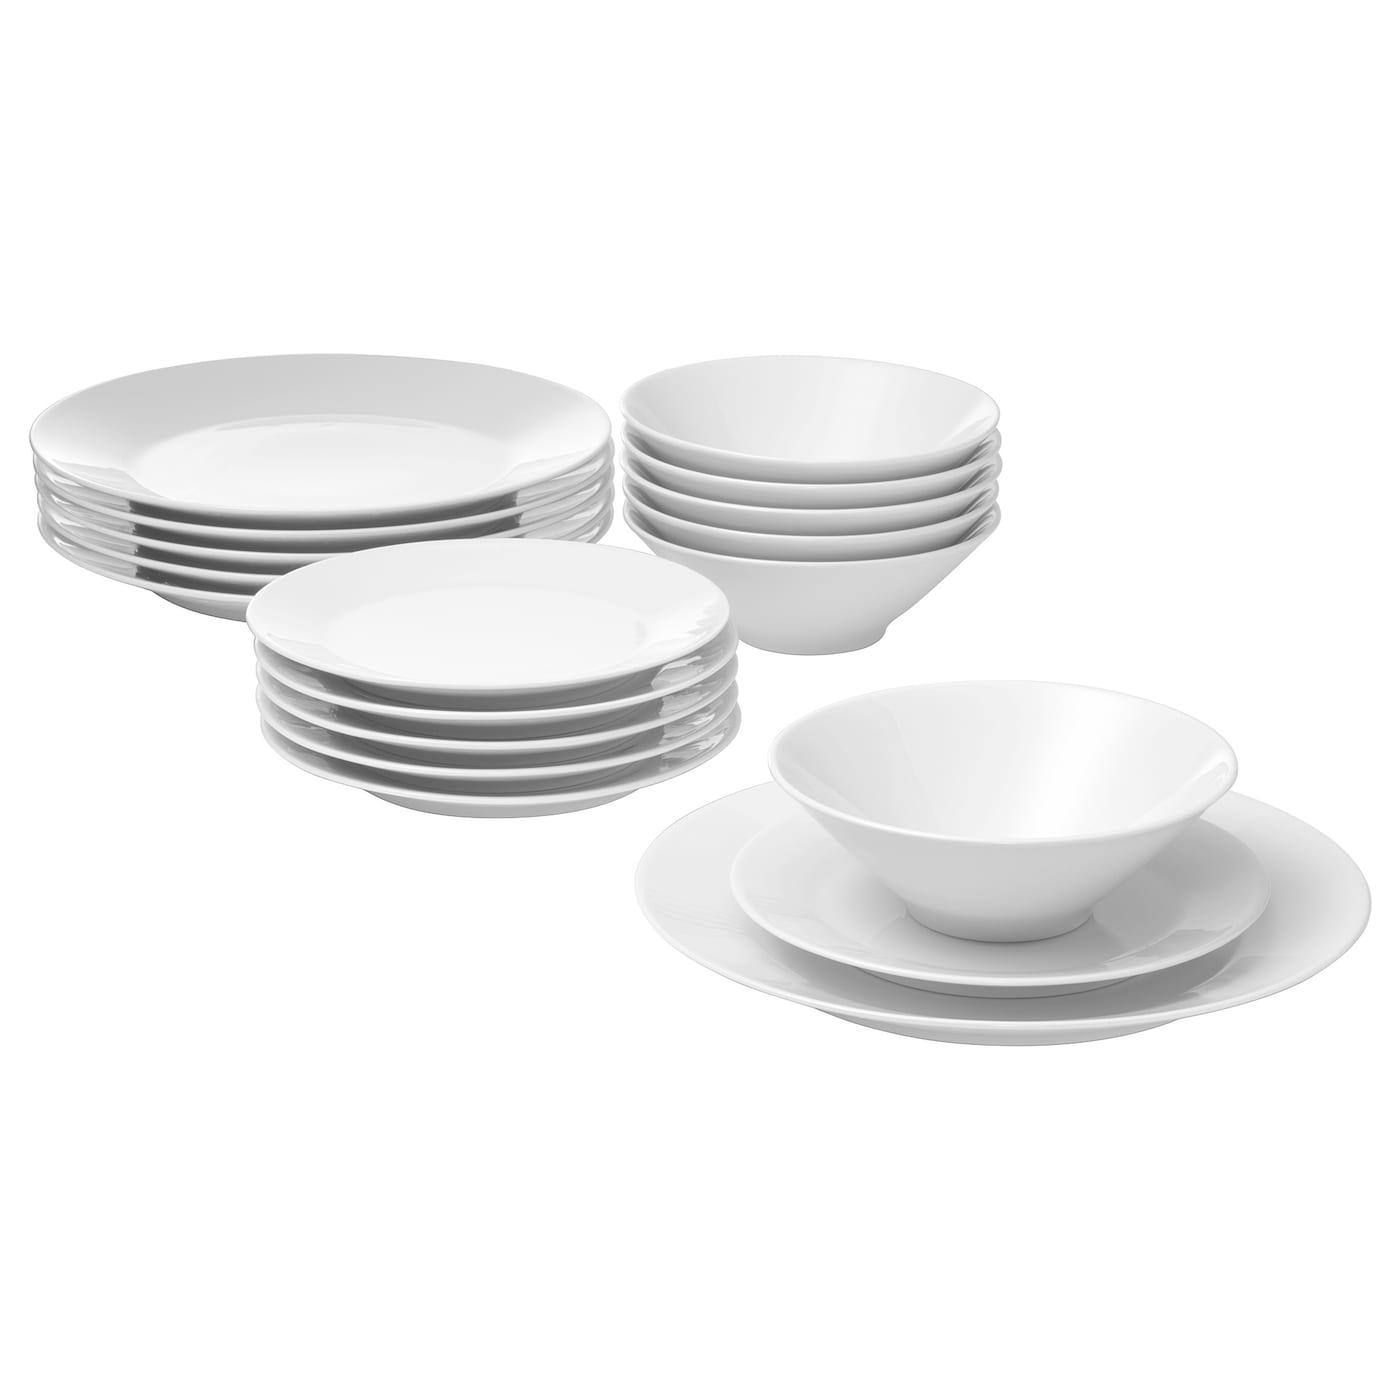 Ikea 365 18 Piece Dinnerware Set White Ikea